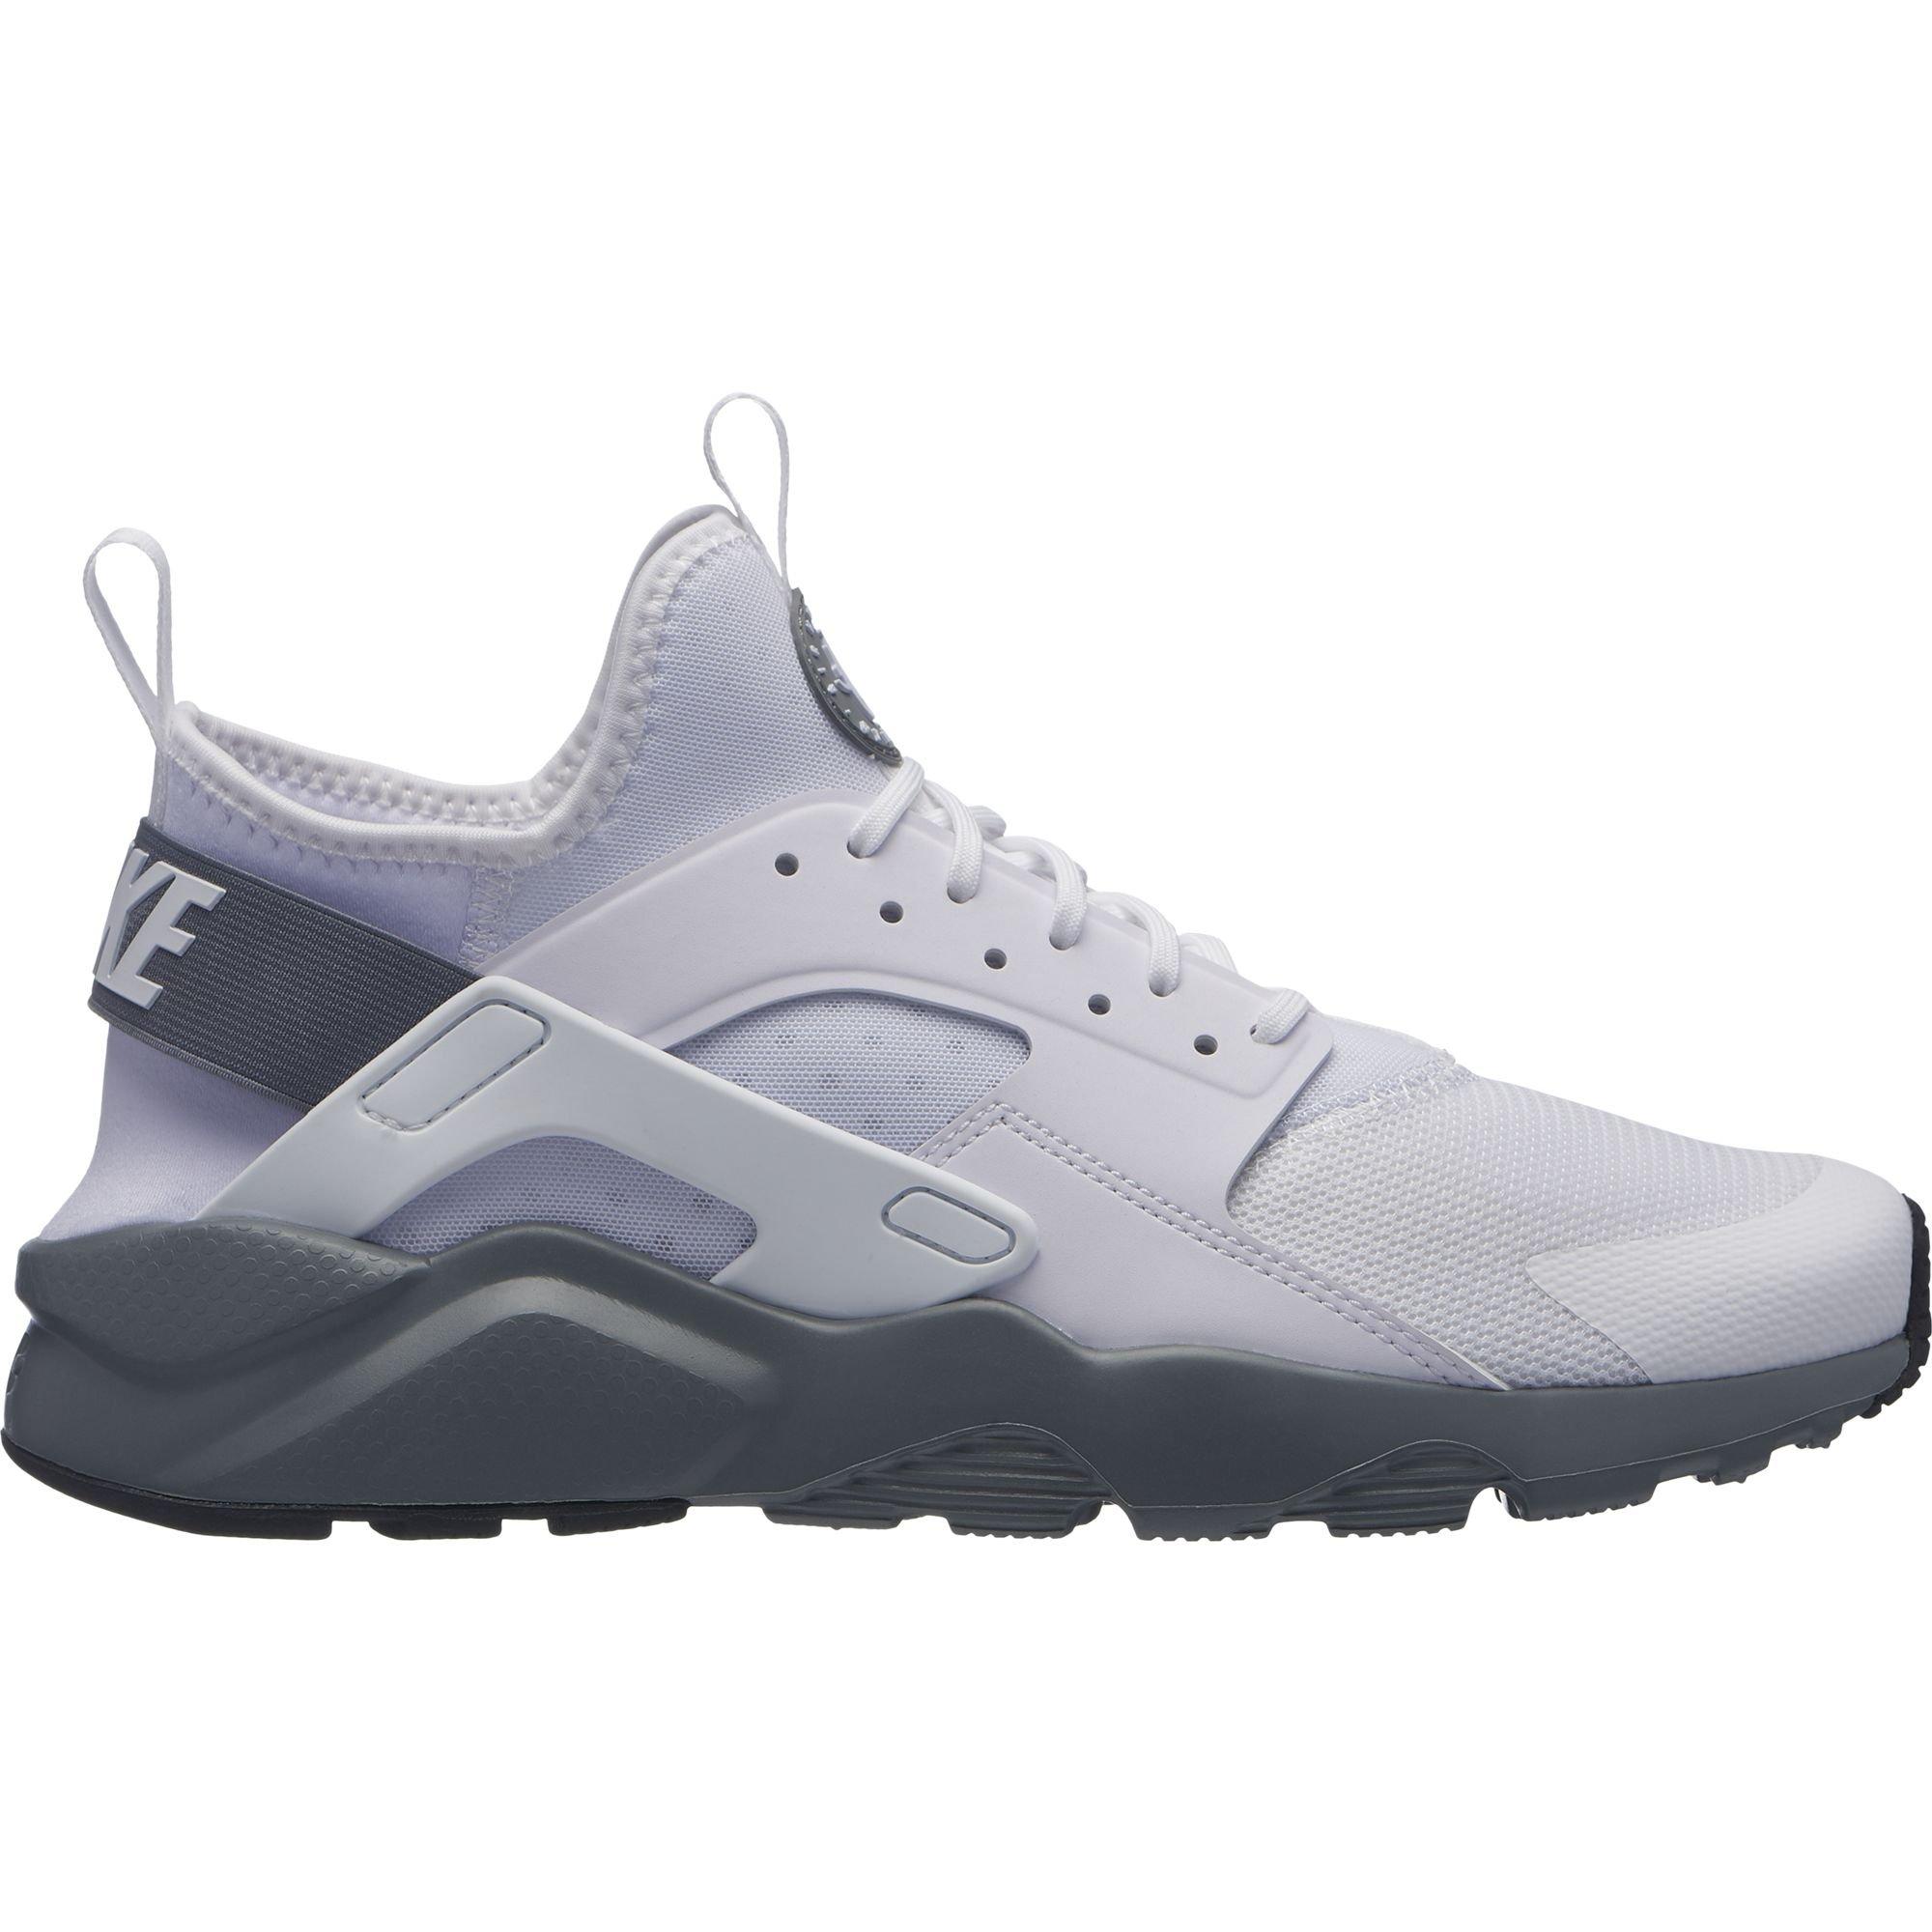 e4bda186f15b7 Galleon - NIKE Men s Air Huarache Run Ultra Sneaker